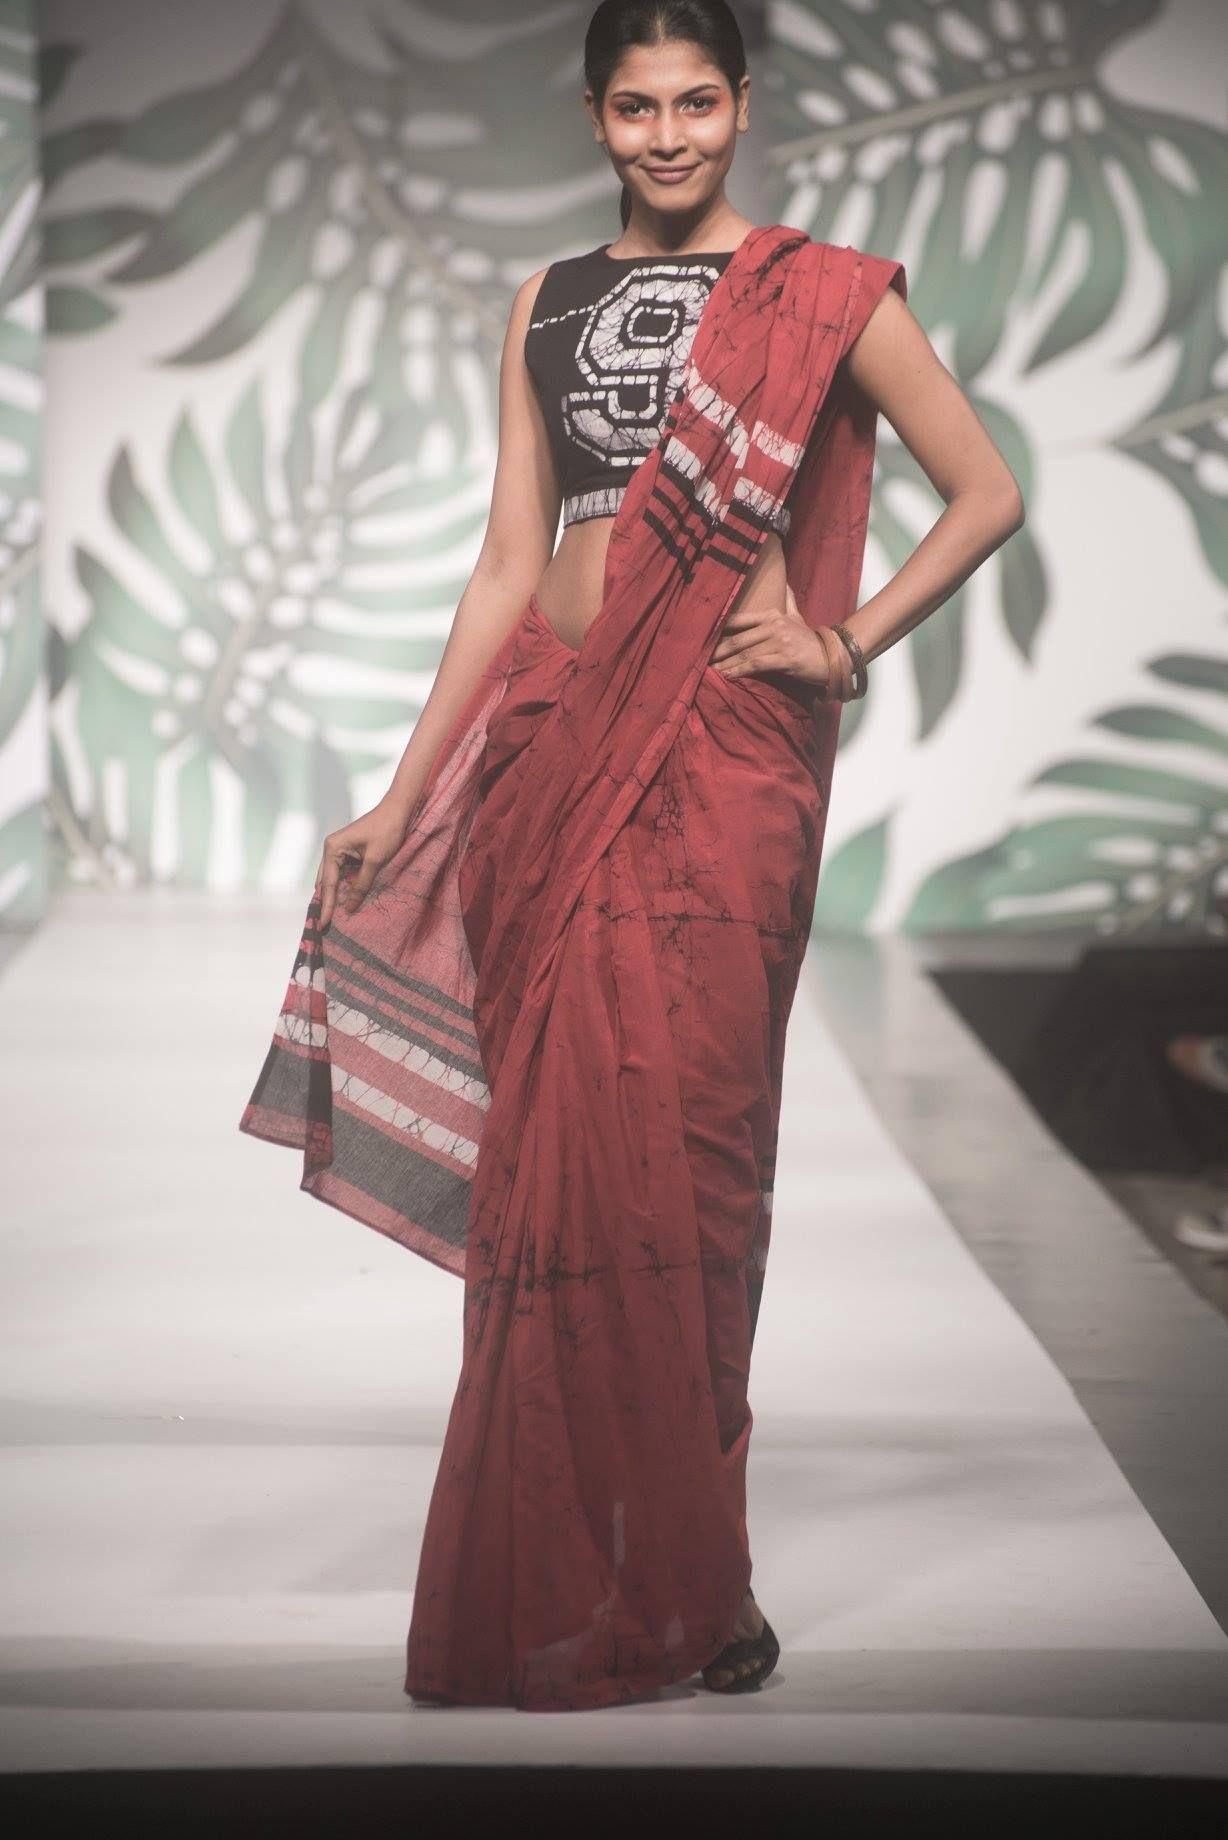 Major Garment Buyers In Bangladesh - Textile Fashion Study Fashion optics sri lanka